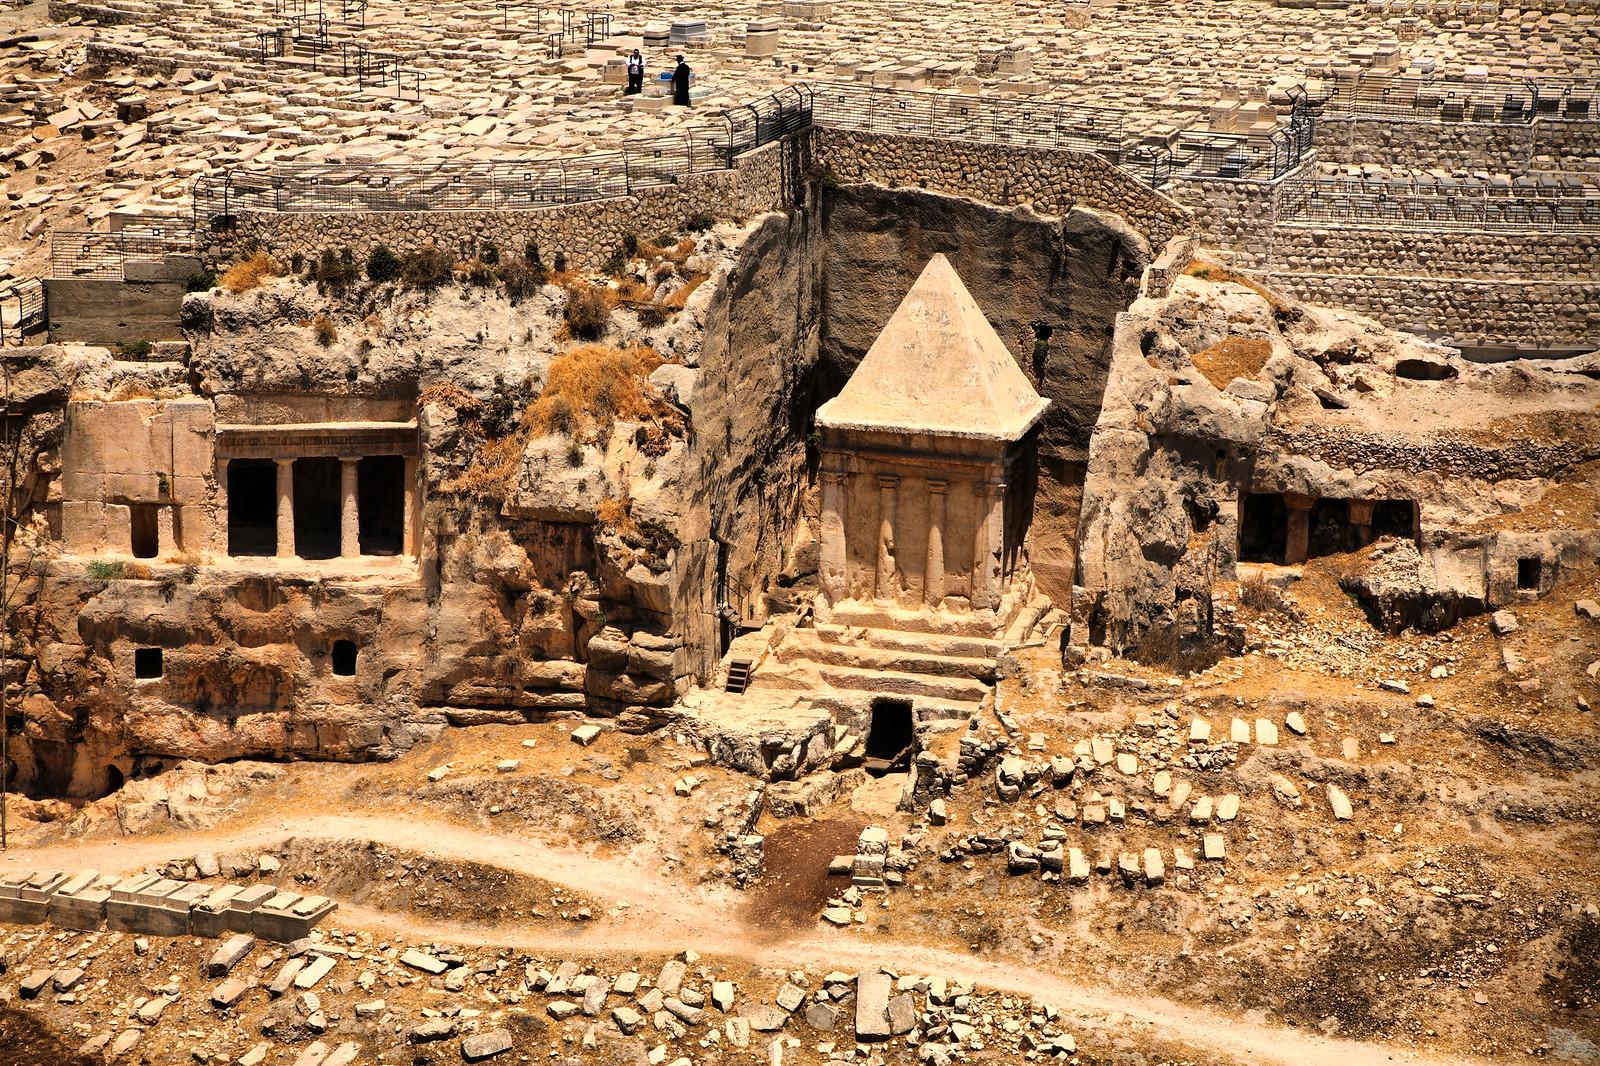 Jerusalem_Kidron Valley_tombs_Noam Chen_IMOT